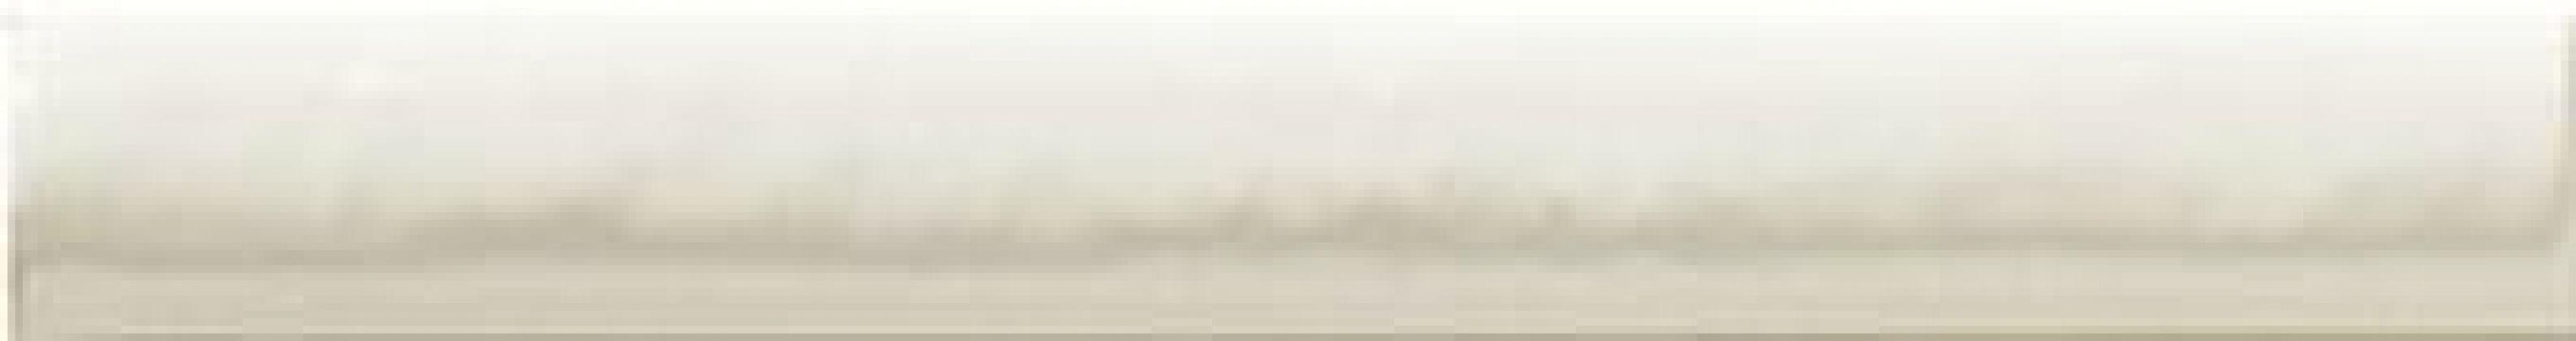 TORELO CHIC NEUTRO 2x15